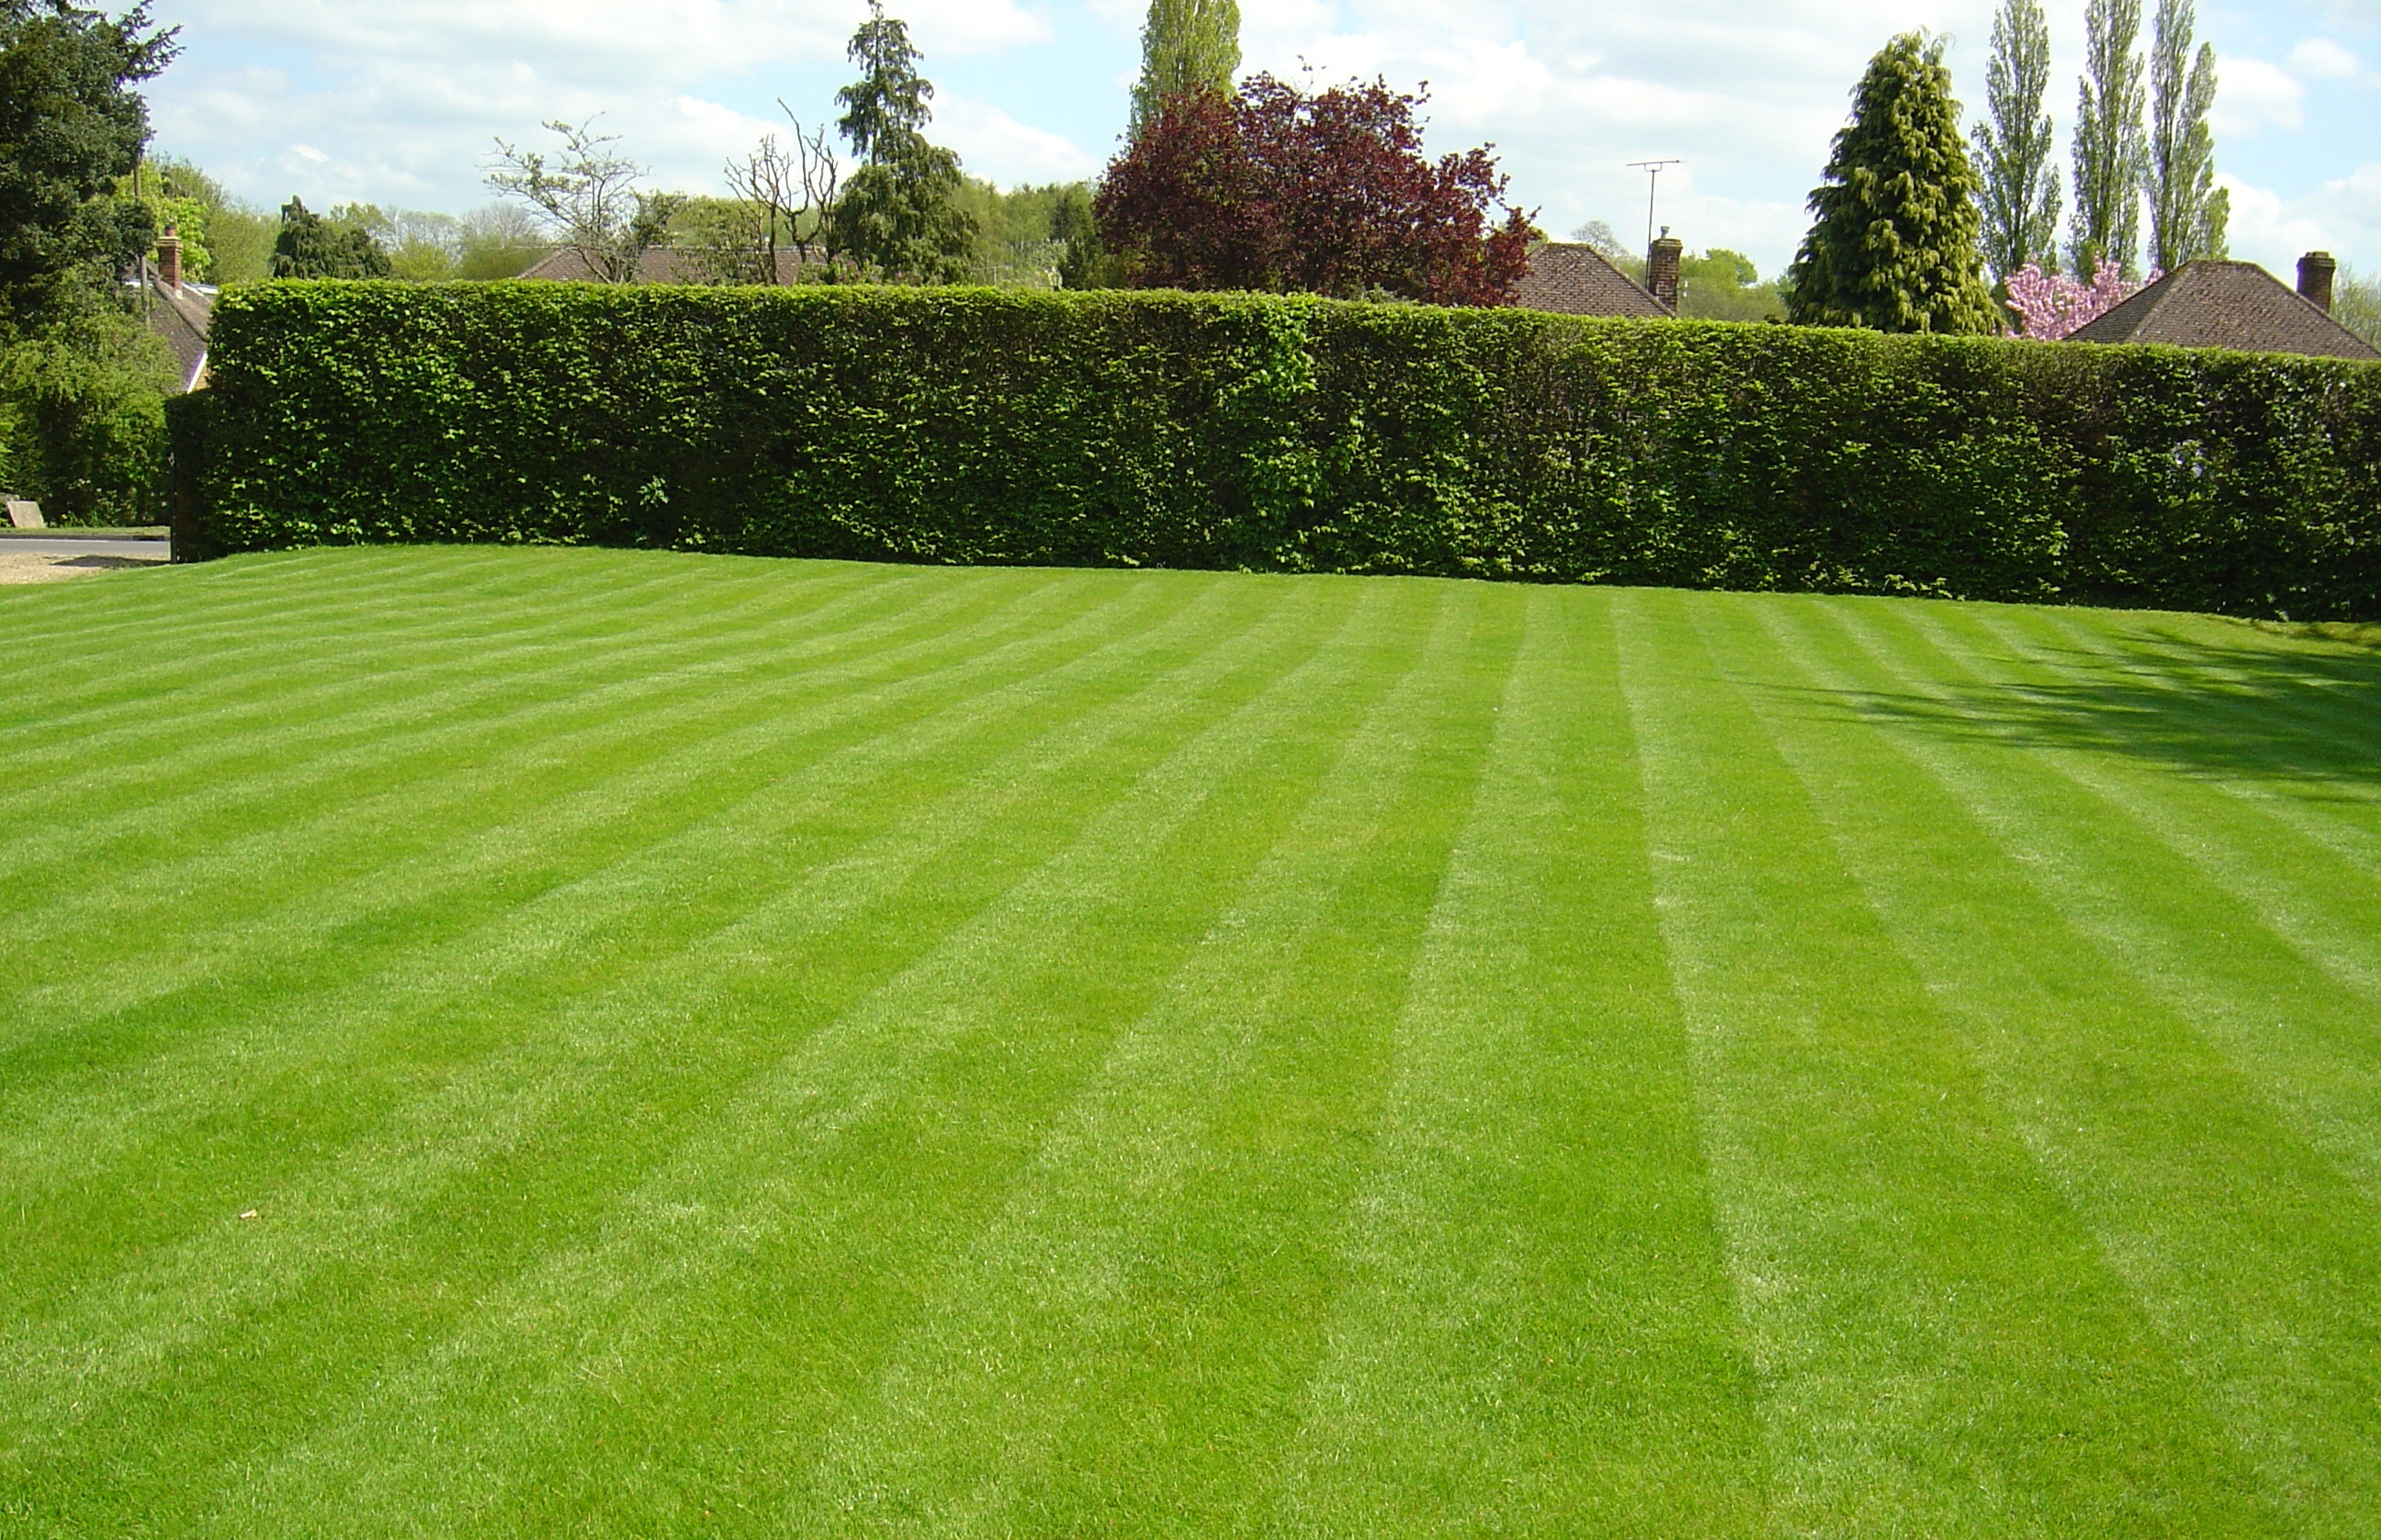 Grass Pic1.jpg